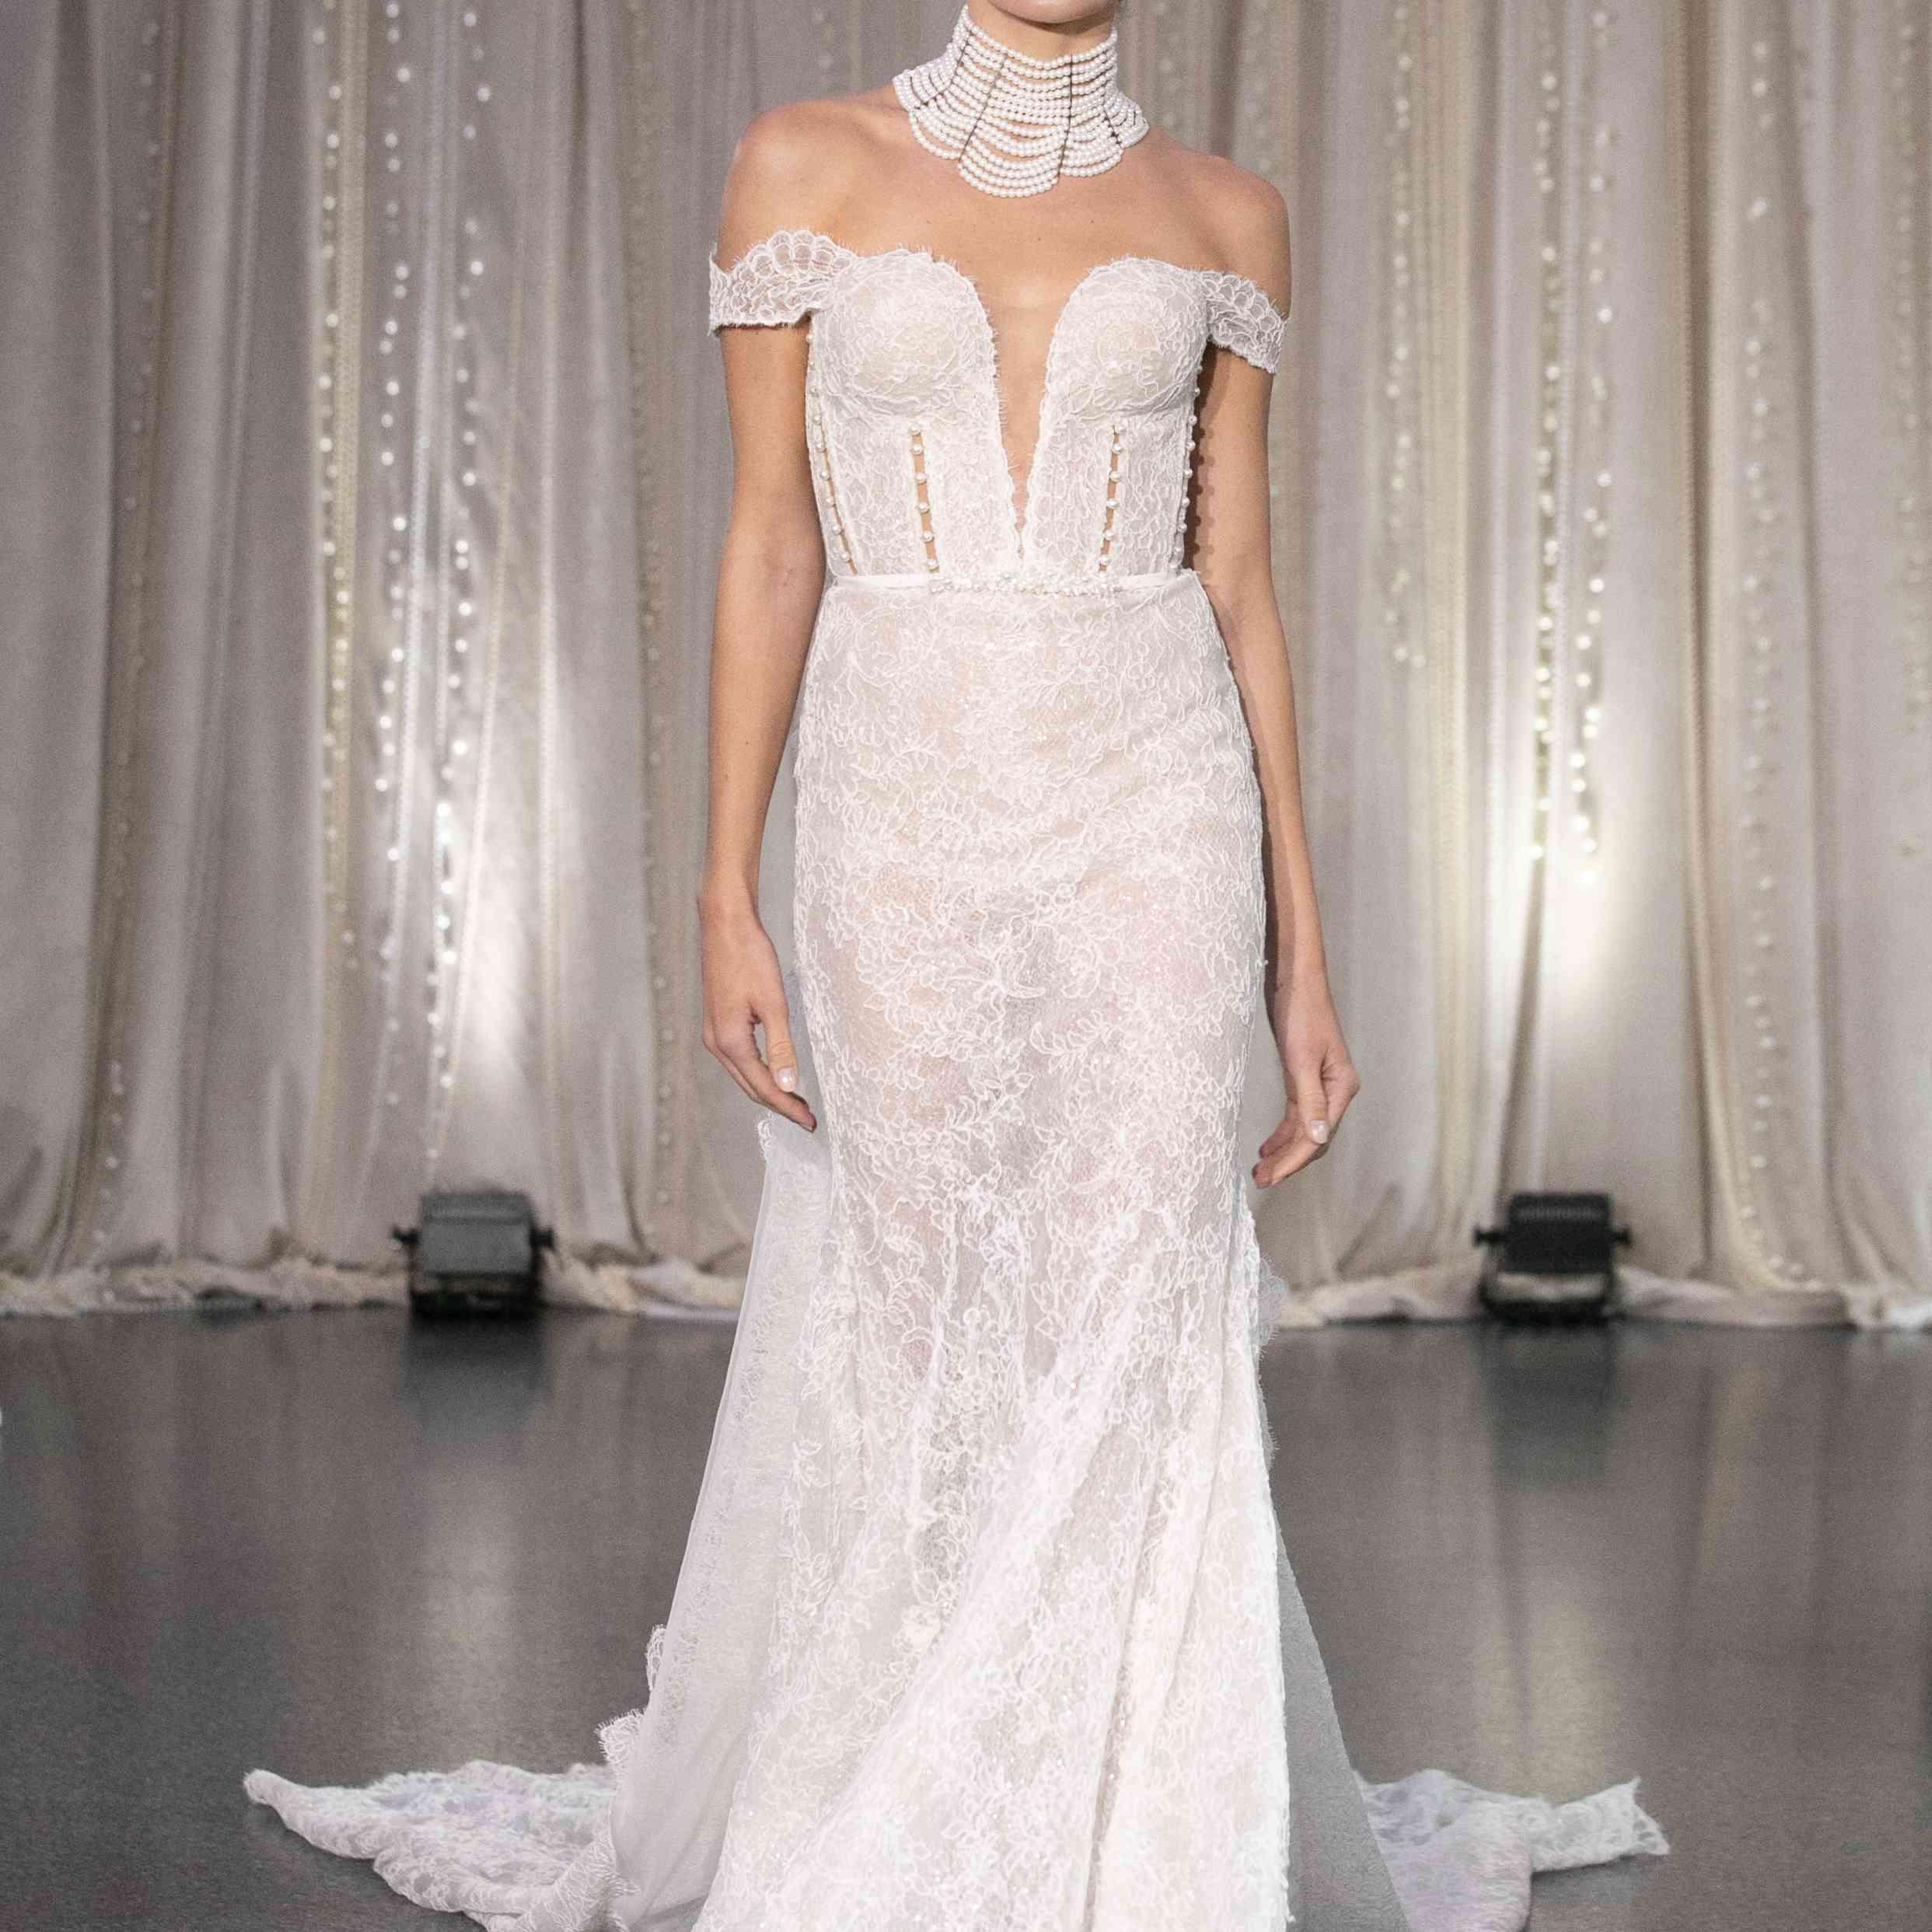 Model in off-the-shoulder mermaid wedding dress